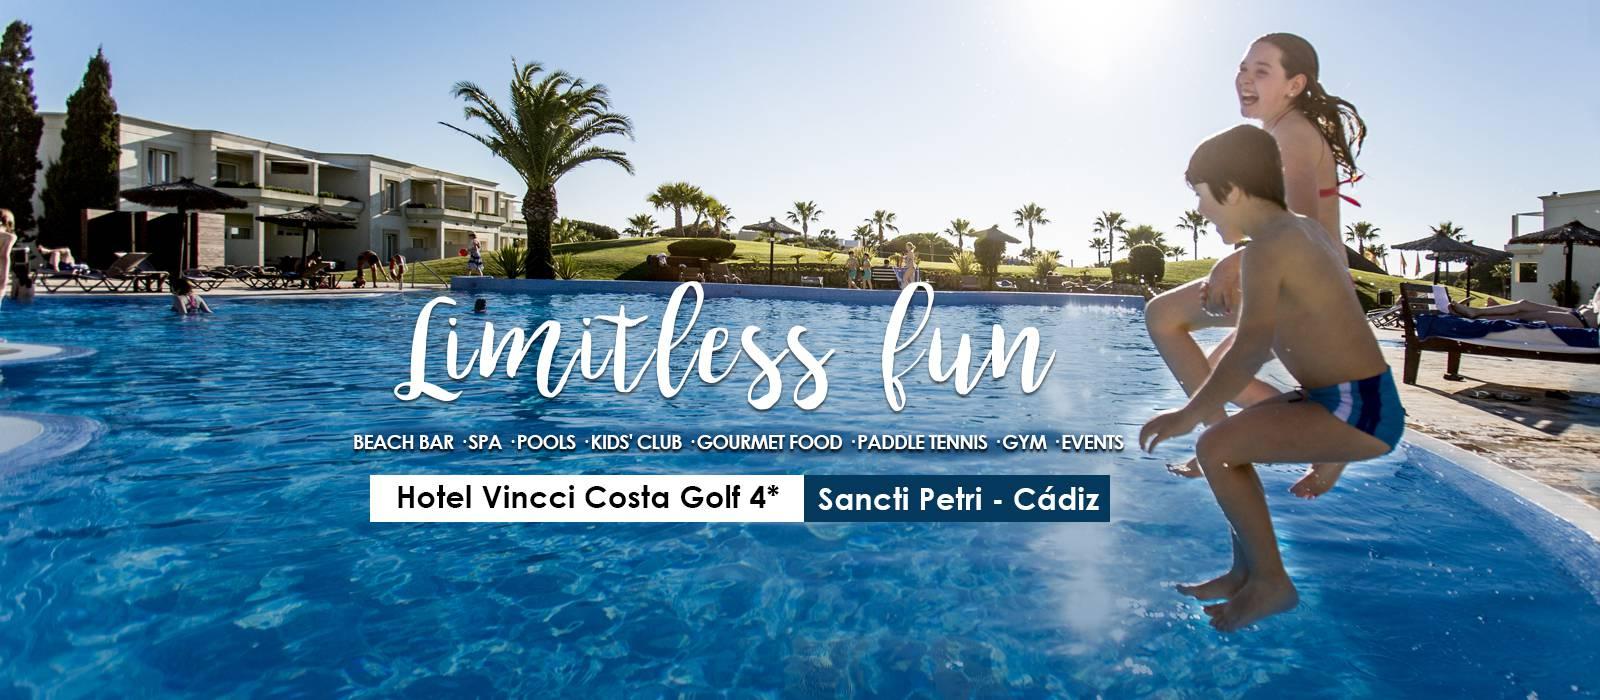 Costa Golf - Vincci Hoteles